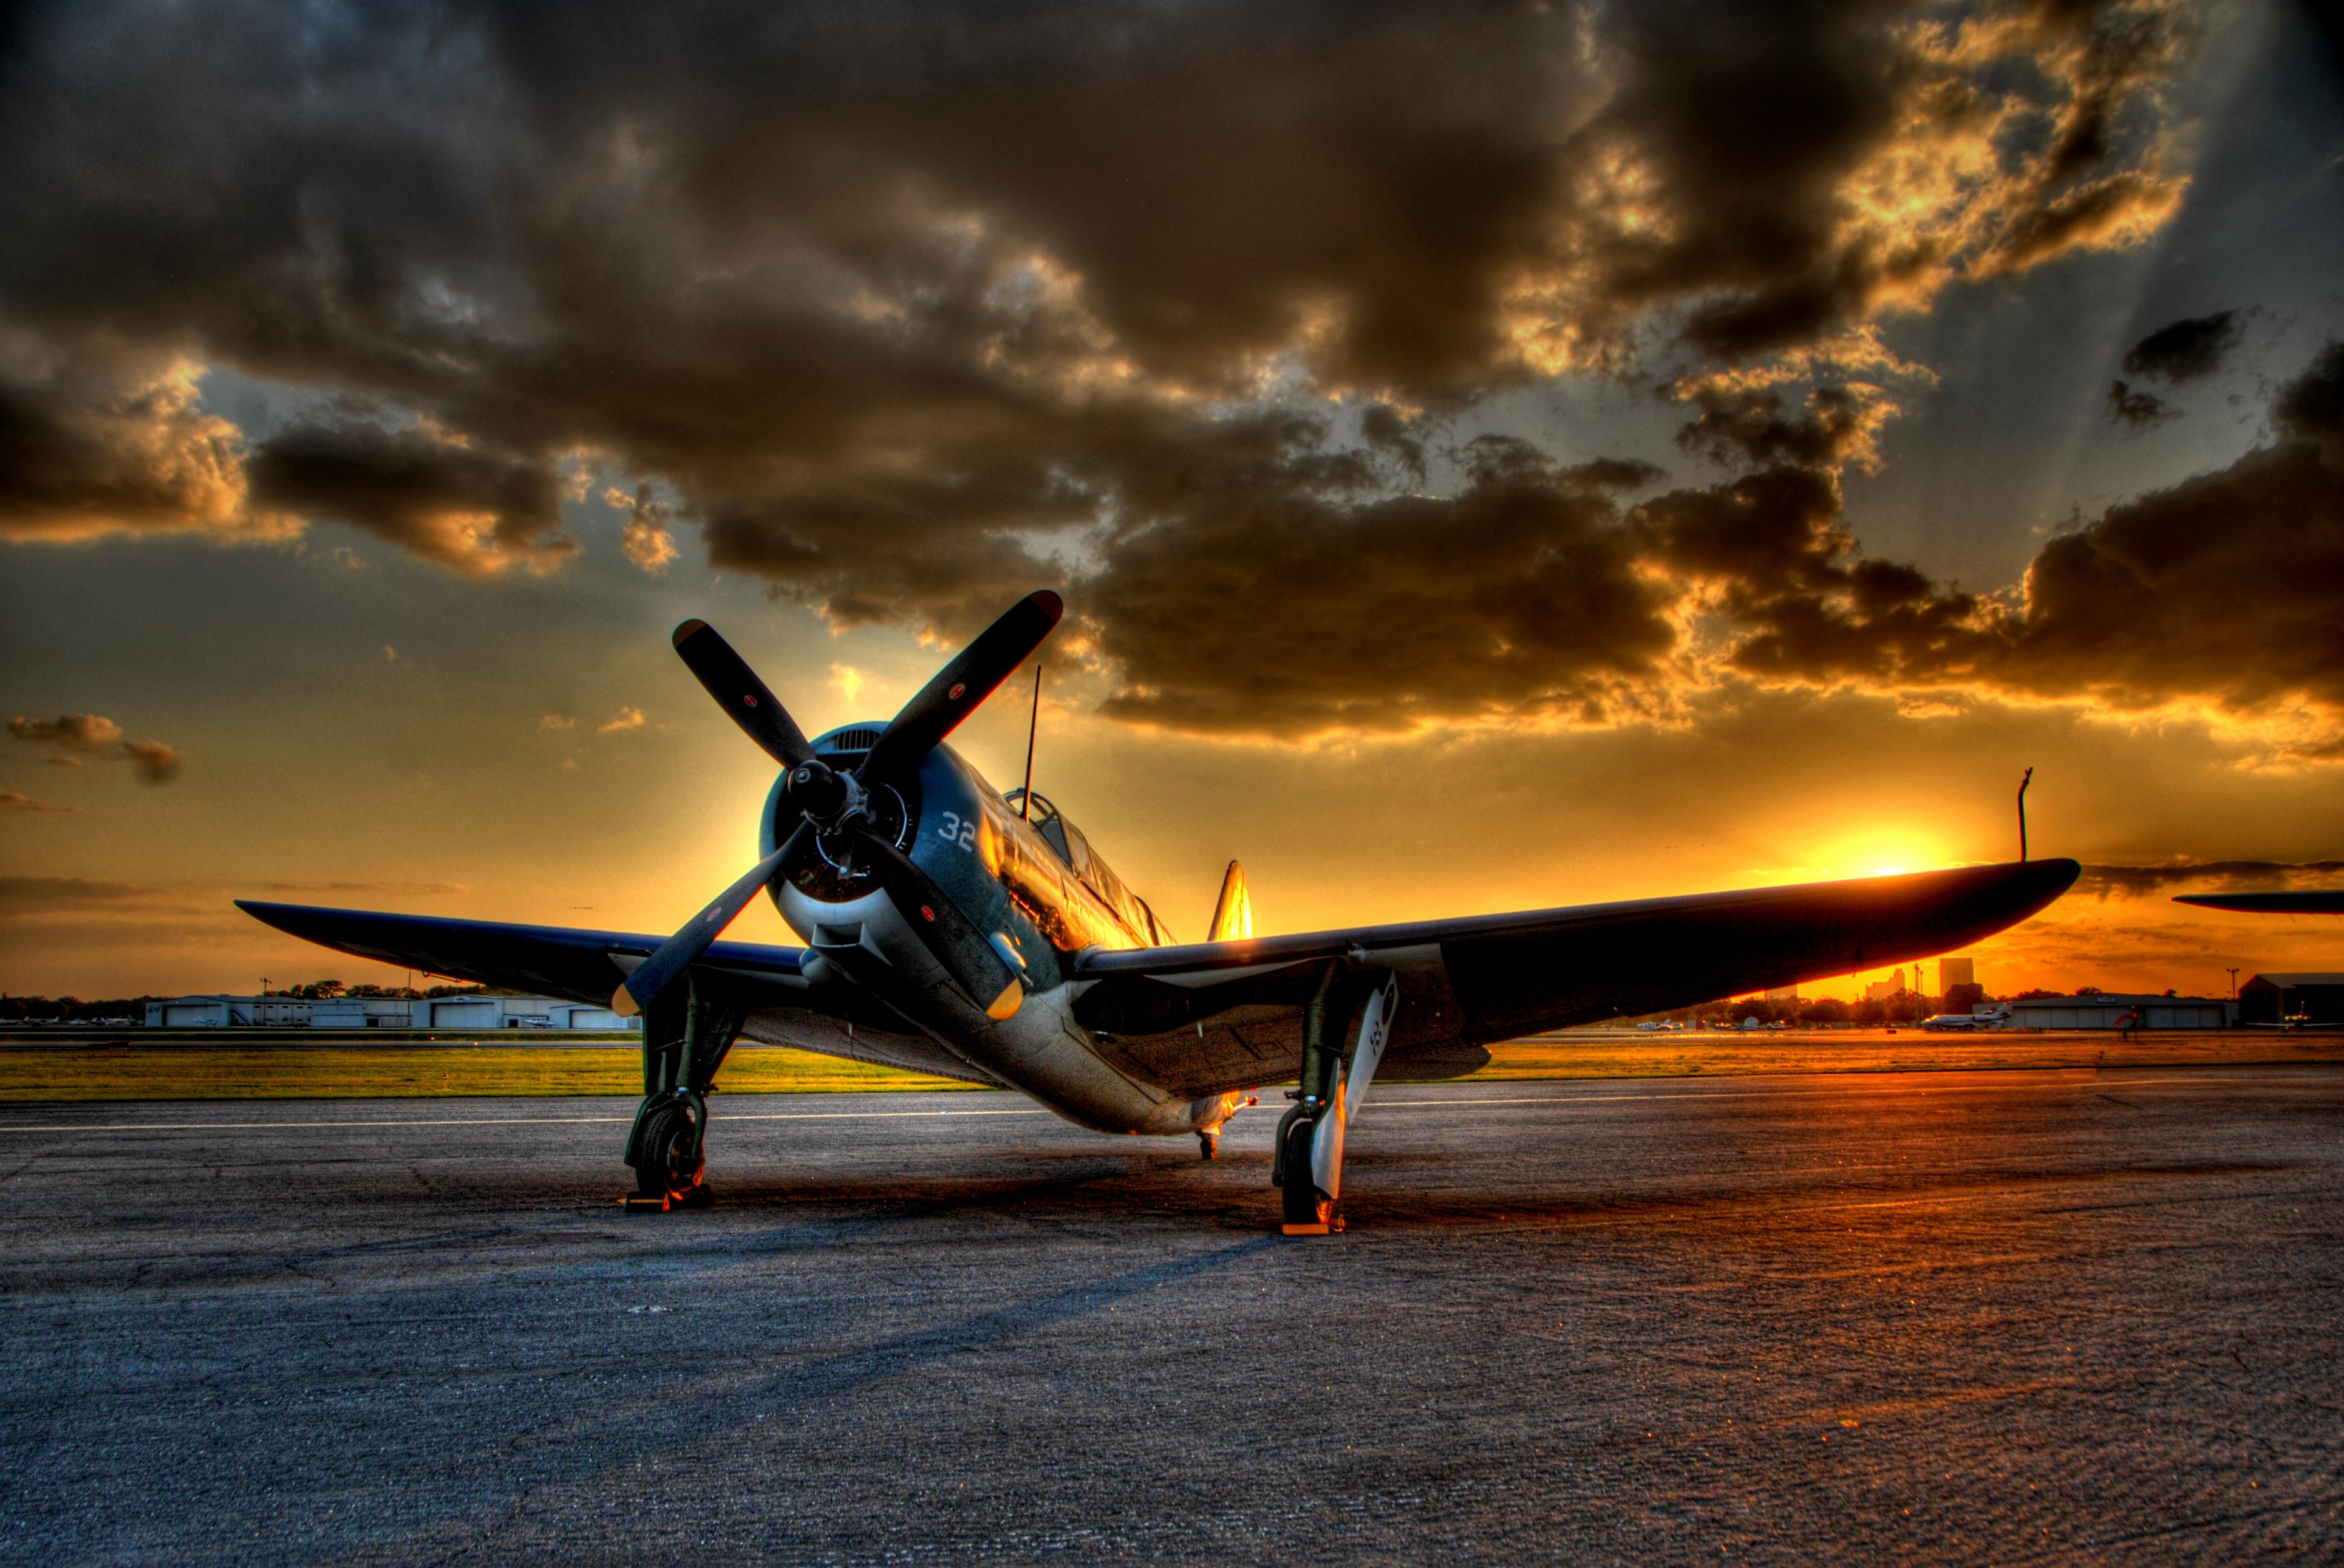 Helldiver Sunset